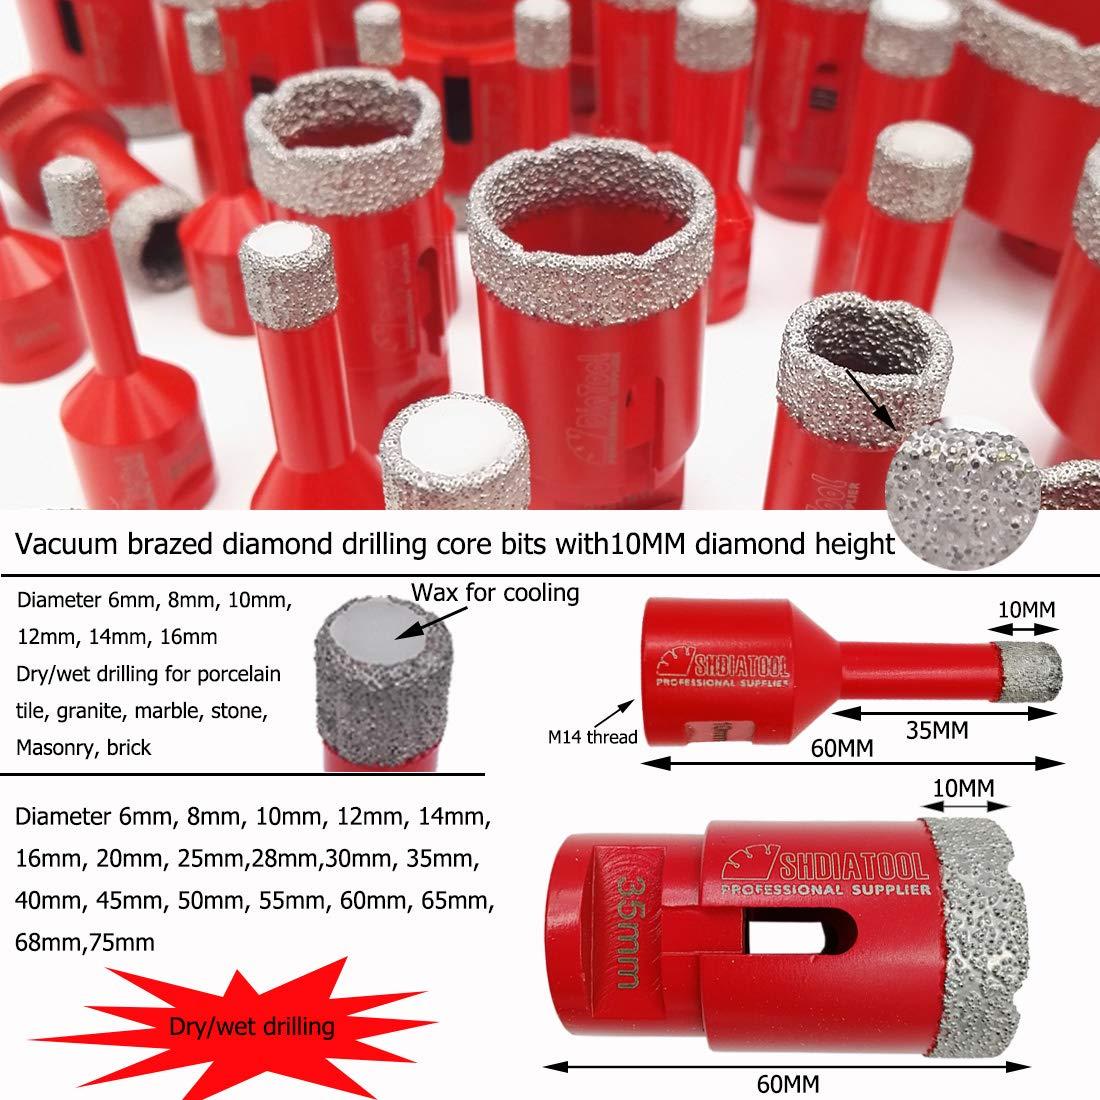 SHDIATOOL Dry Diamond Drill Bits Set Vacuum Soldered Holes Porcelain Tiles Granite Marble